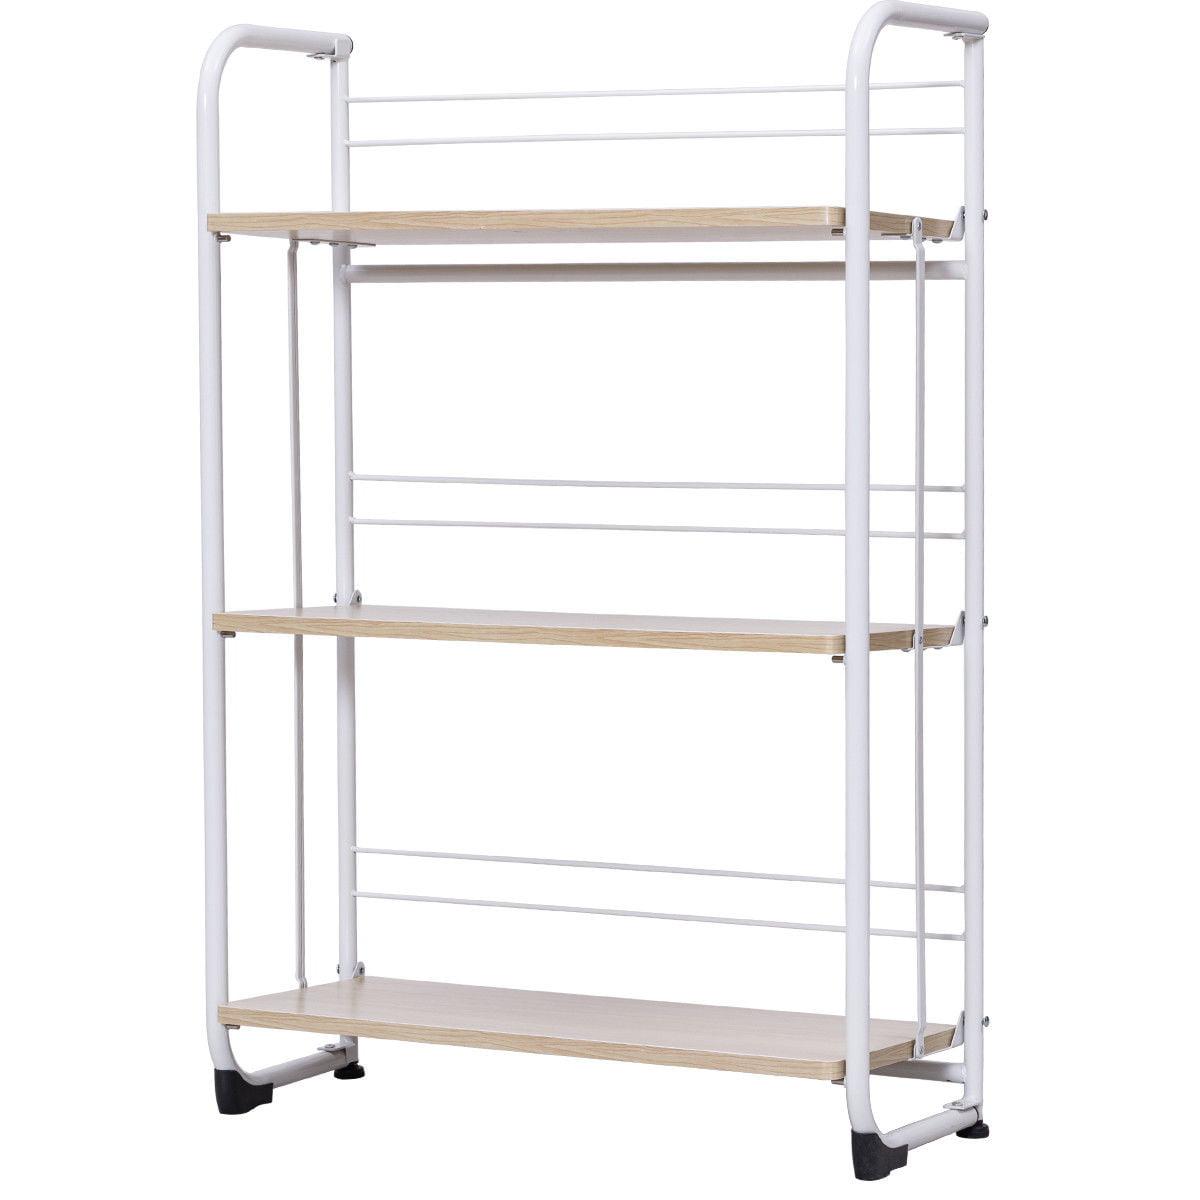 Gymax Folding 3 Tier Shelves Organization Storage Utility Shelving Unit Standing Rack - image 6 of 10